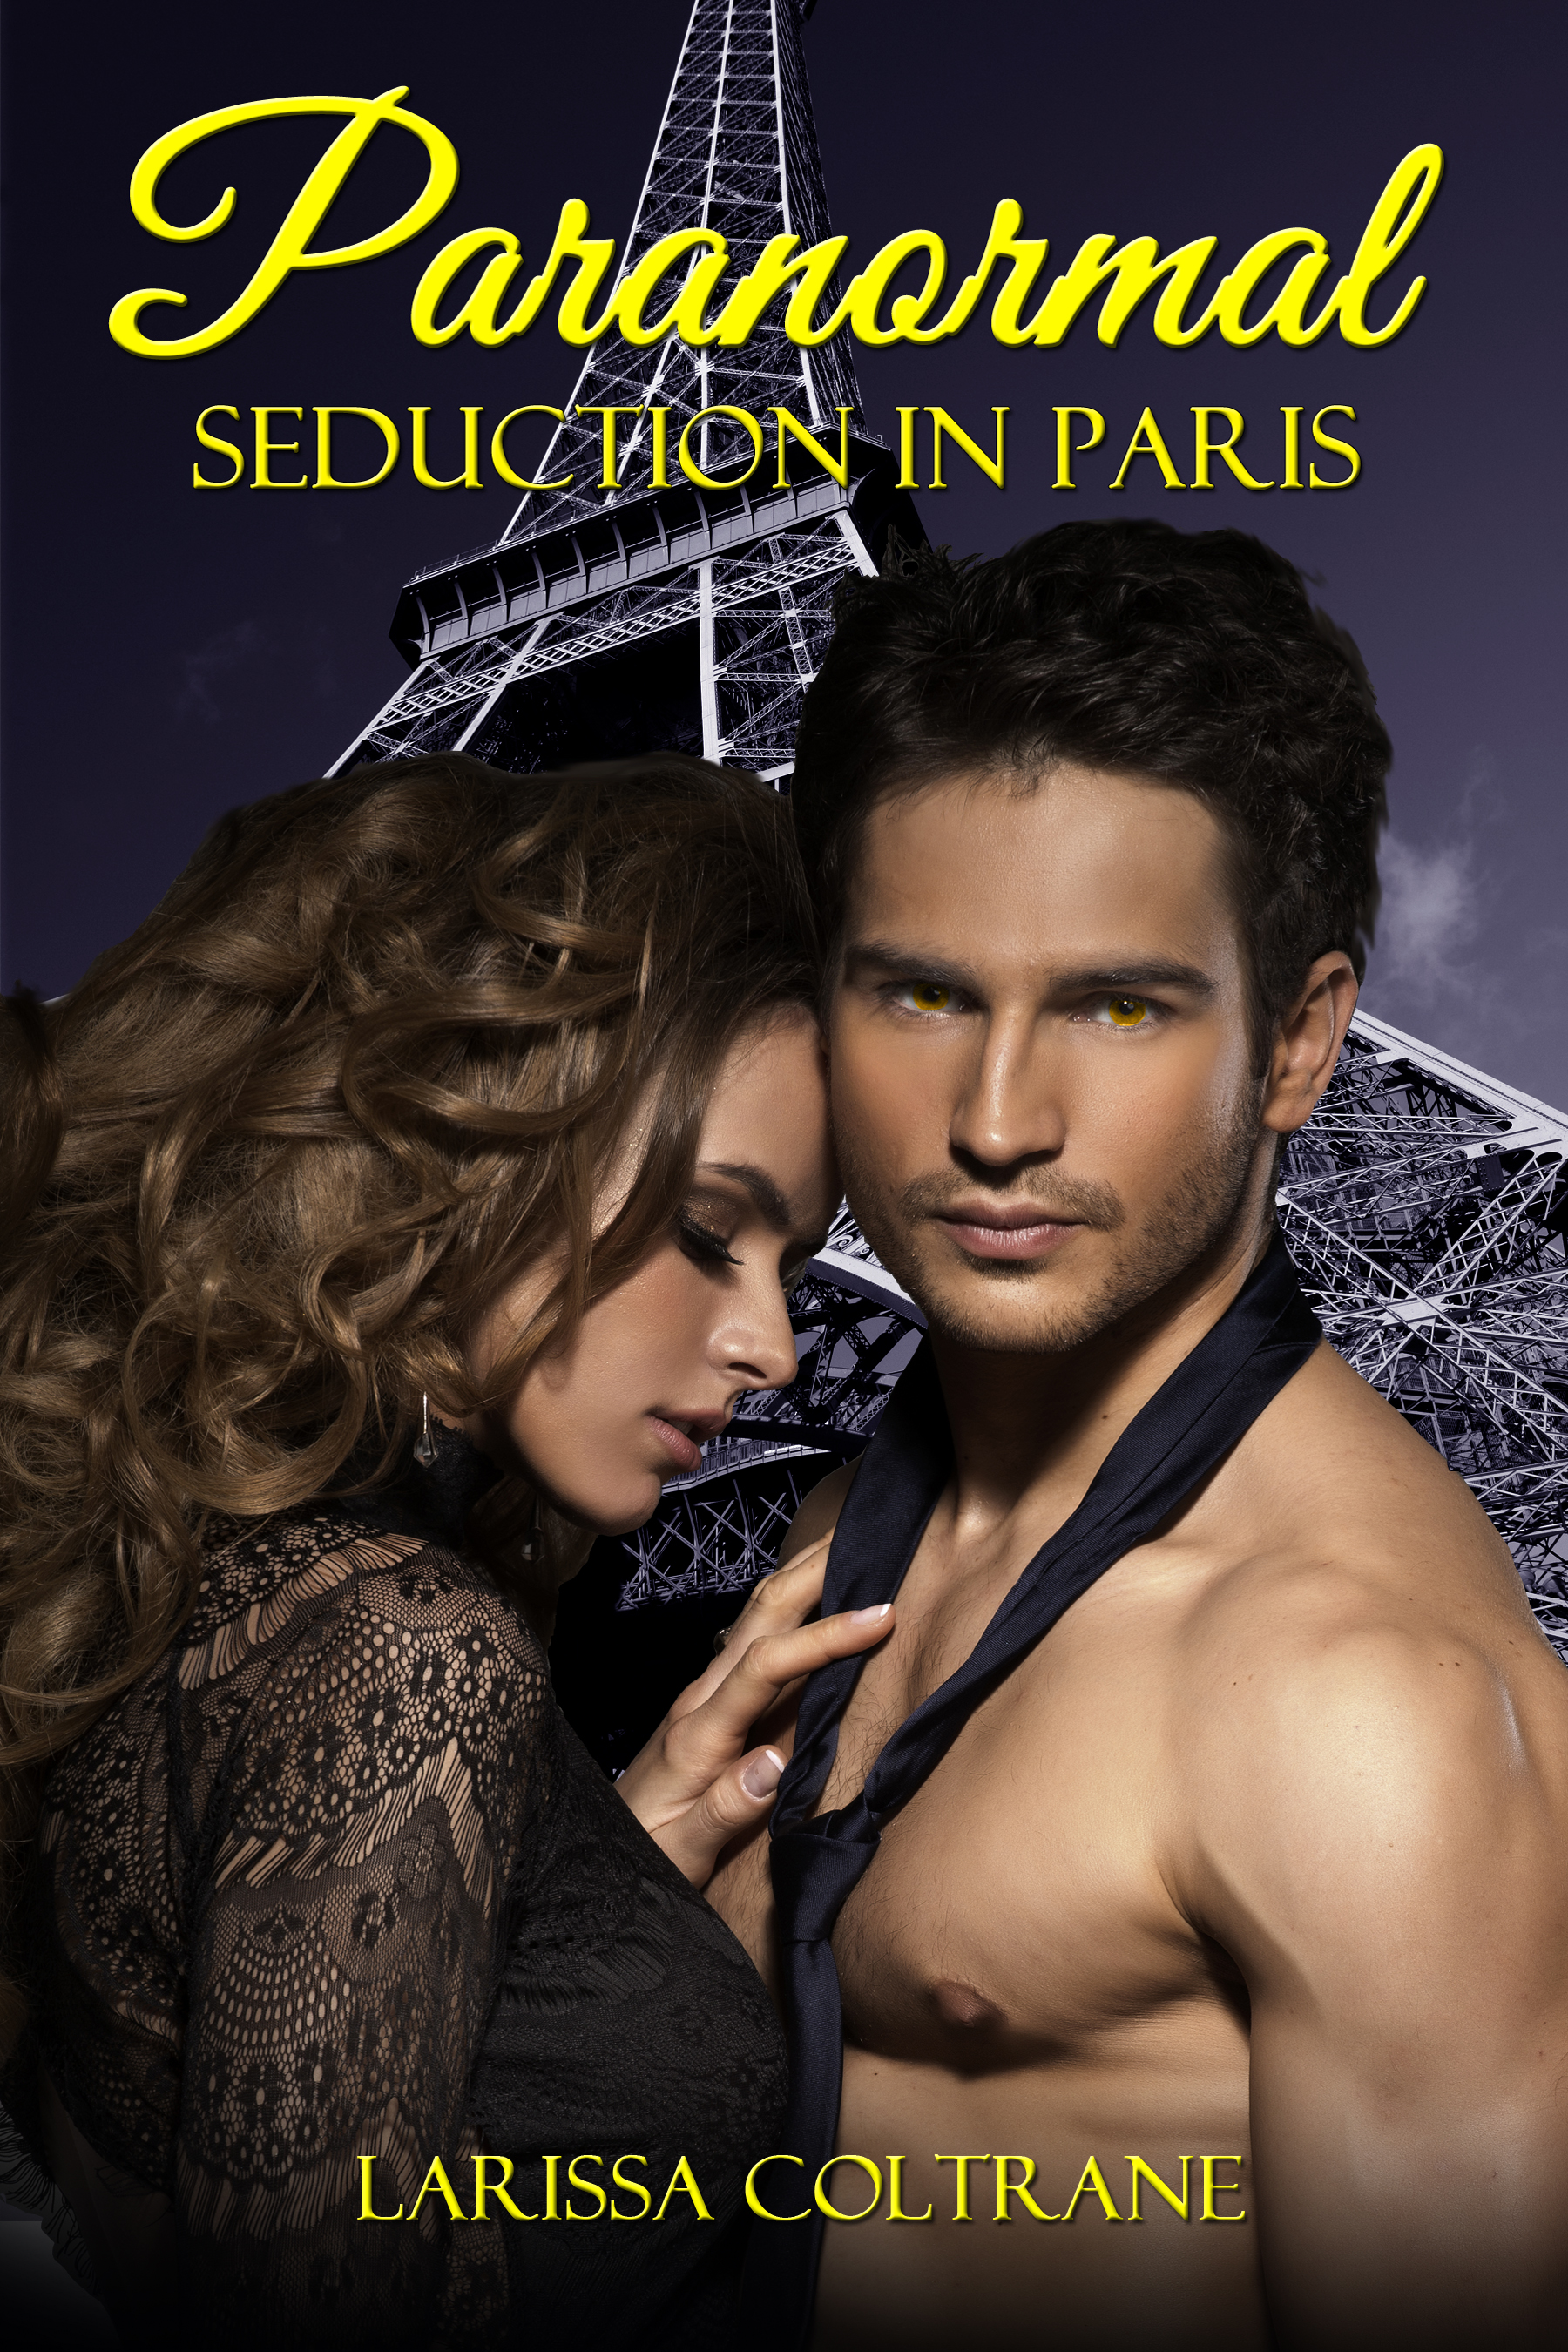 Larissa Coltrane - Paranormal Seduction in Paris (BBW Paranormal Erotic Short Romance - New Adult (NA) - Werewolf Mate)